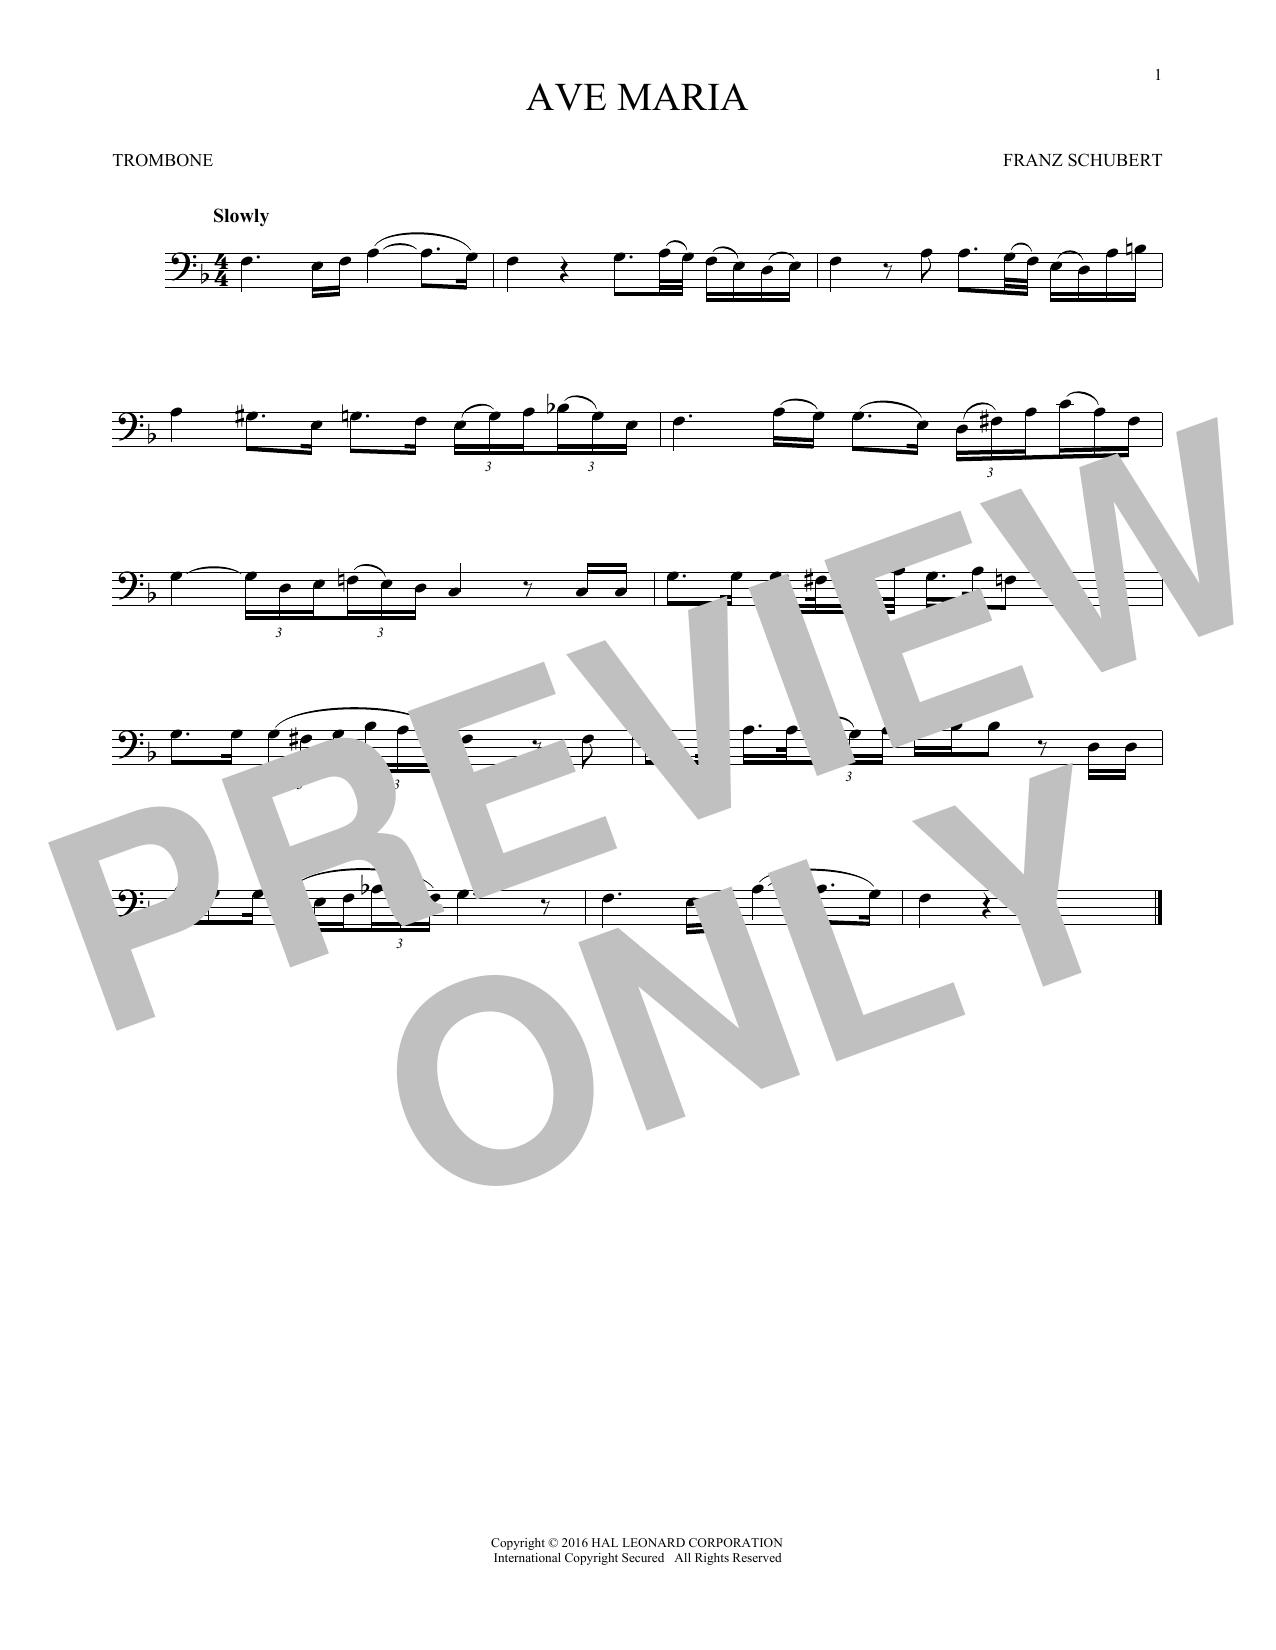 Ave Maria, Op. 52, No. 6 (Trombone Solo)